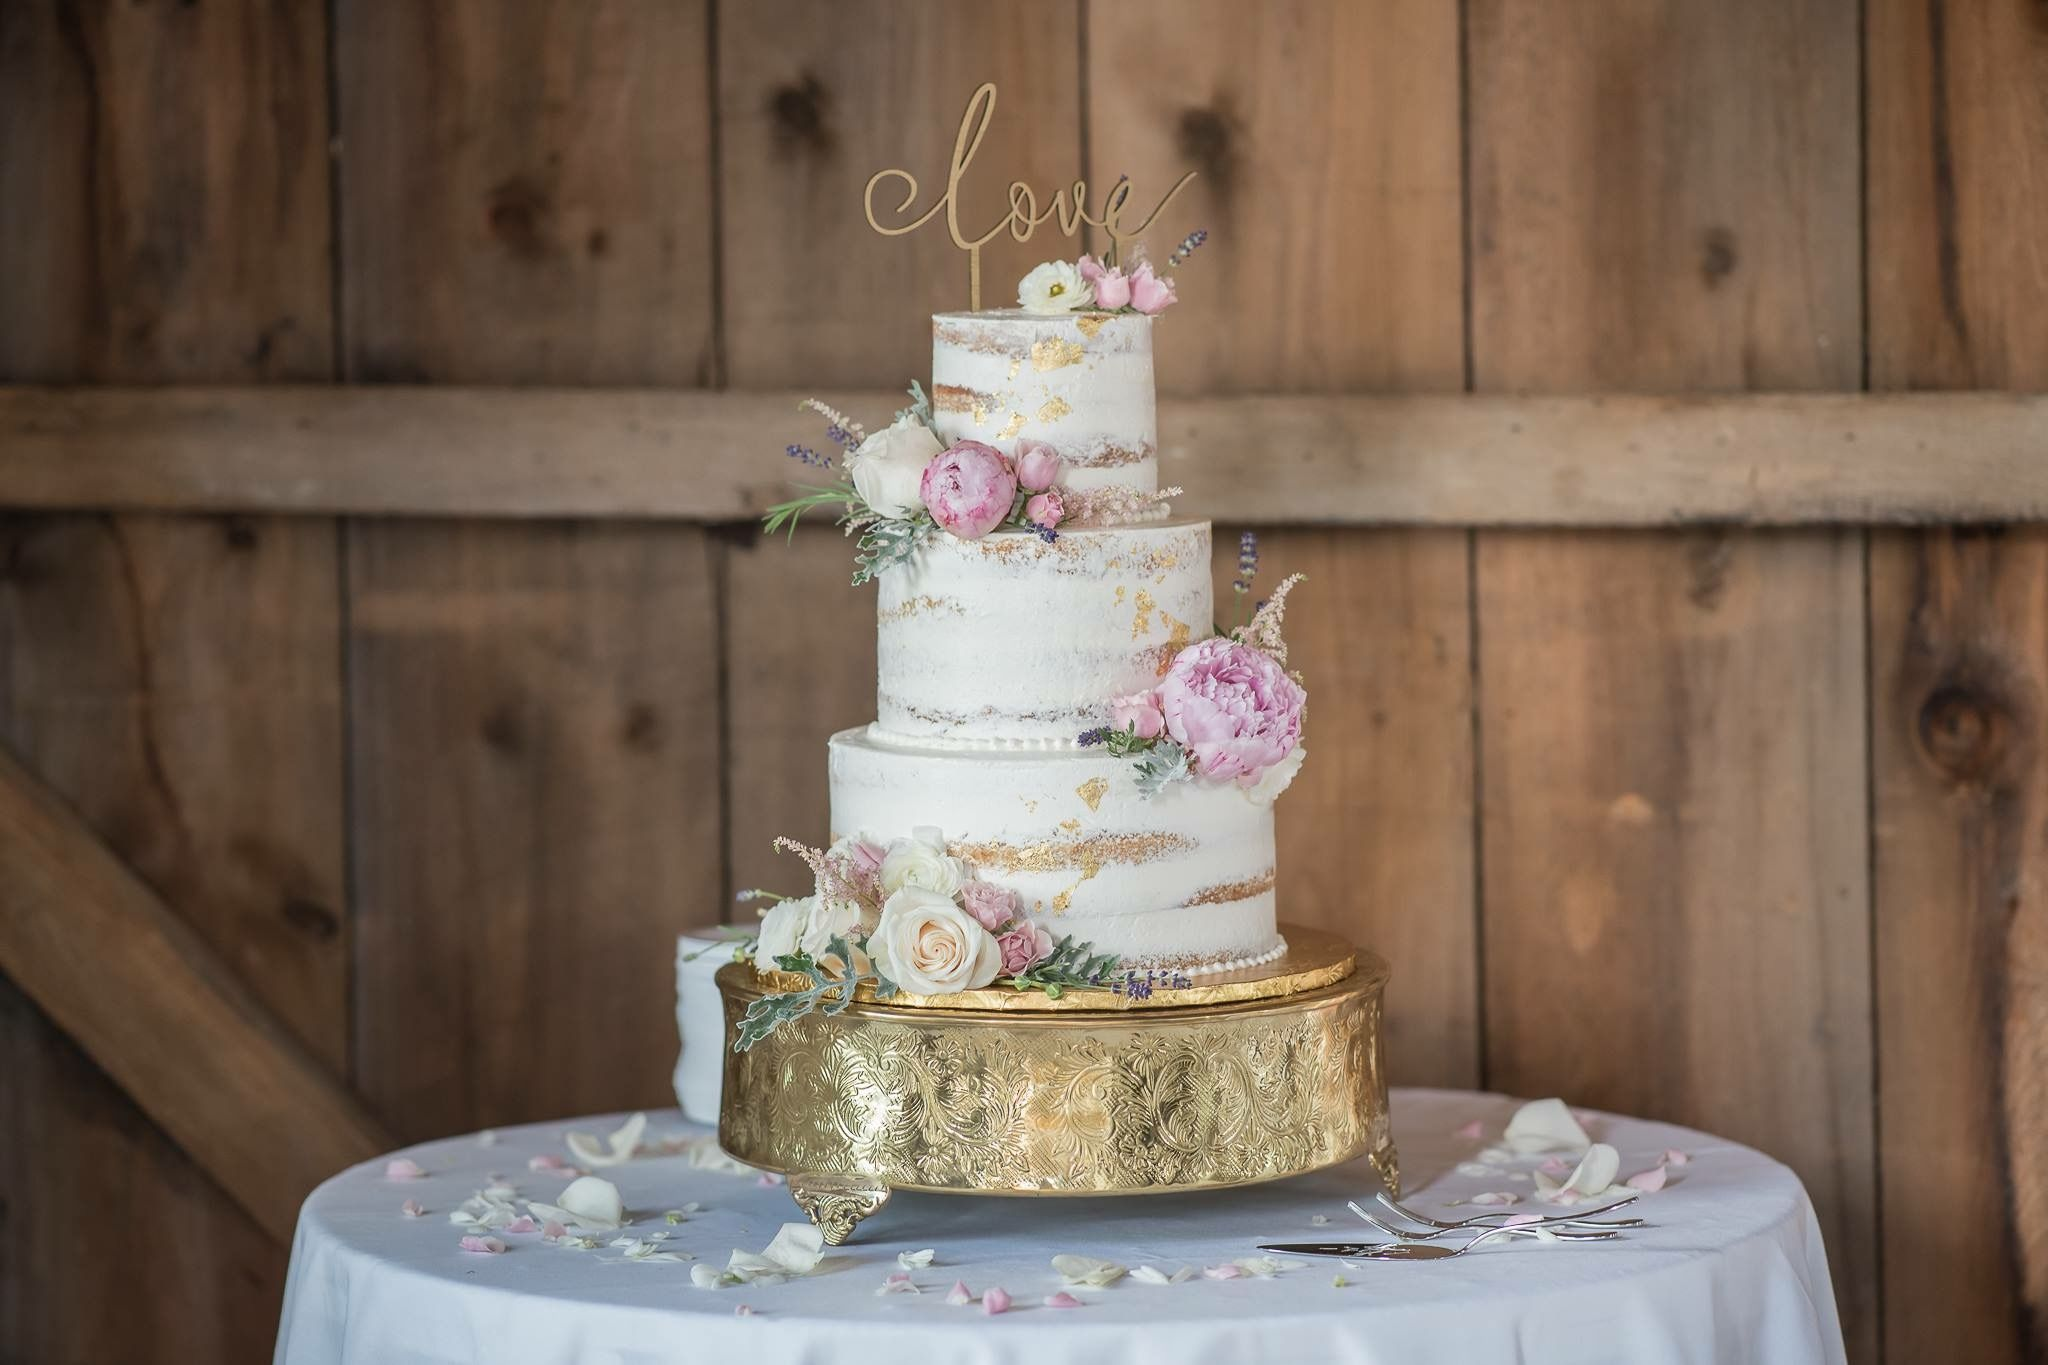 Wedding & Custom Cakes | Cake decorating classes, Cake ...